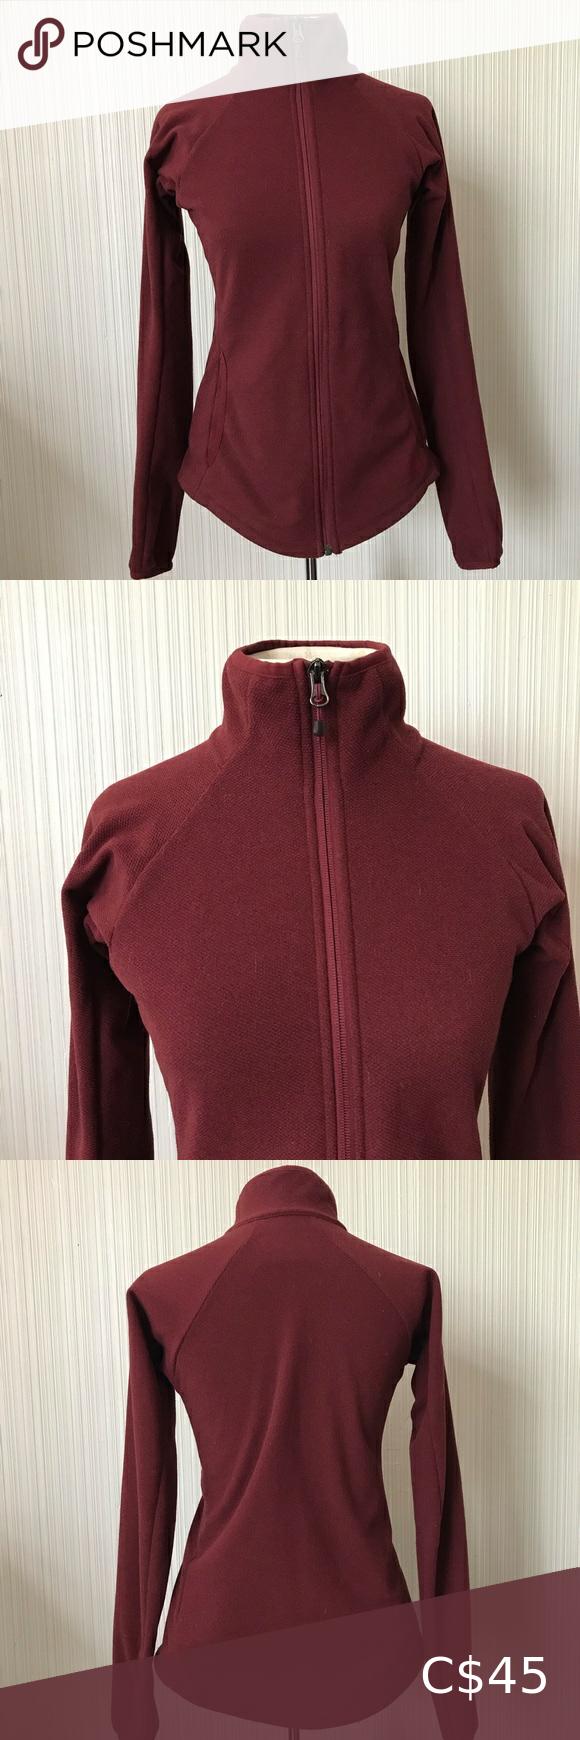 MEC Lightweight Polartec Fleece Jacket